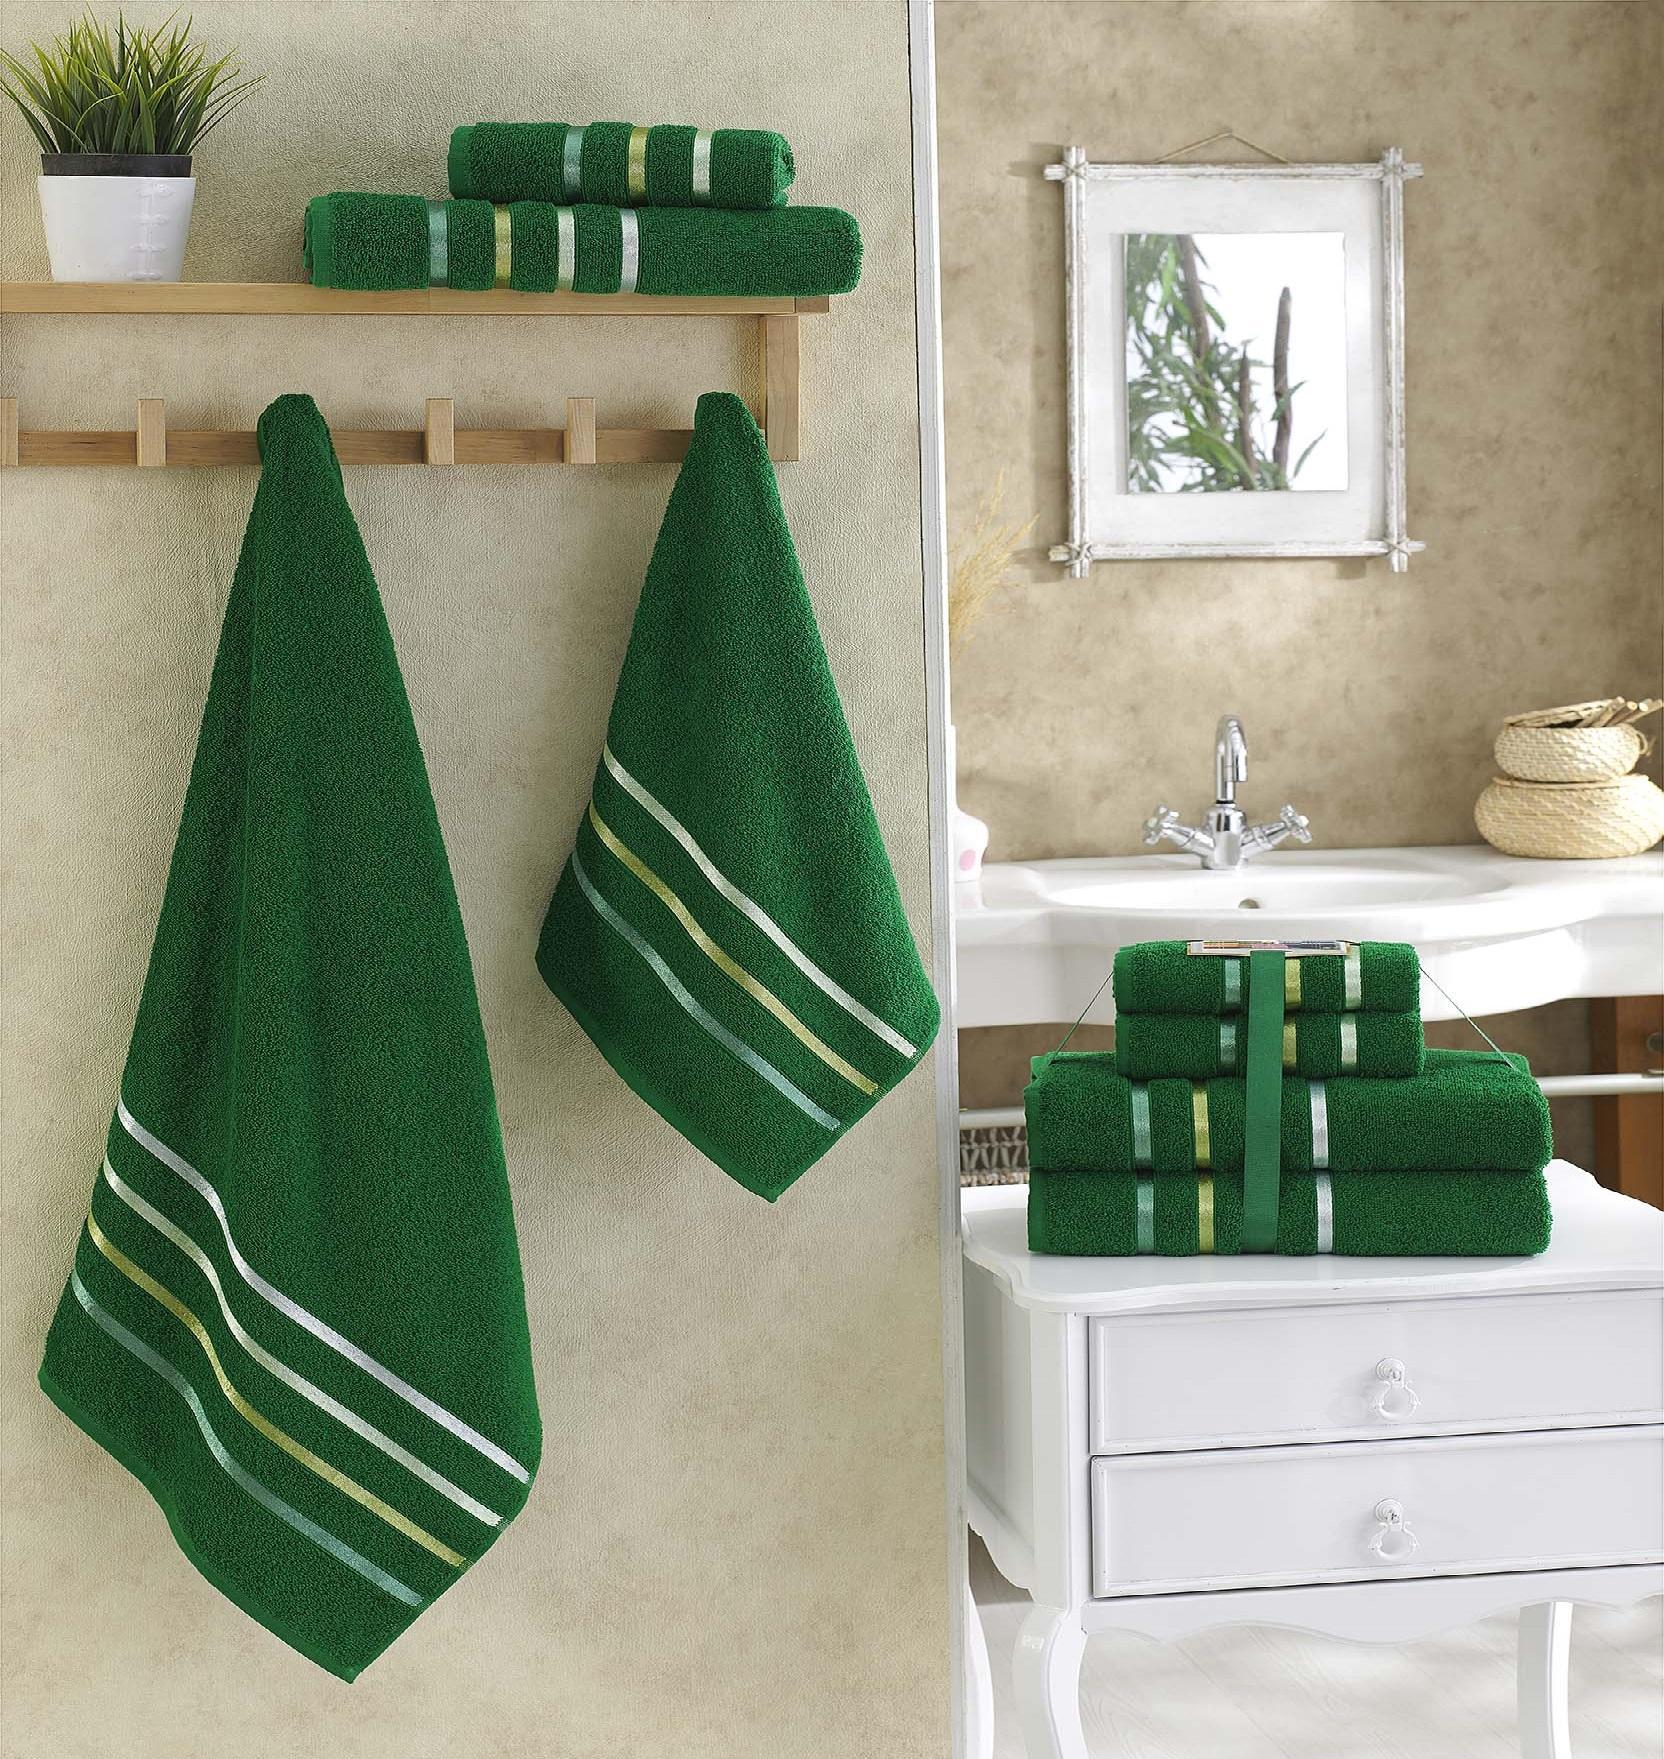 Полотенца Karna Полотенце Bale Цвет: Темно-Зеленый (Набор) полотенца karna полотенце bale цвет розовый набор